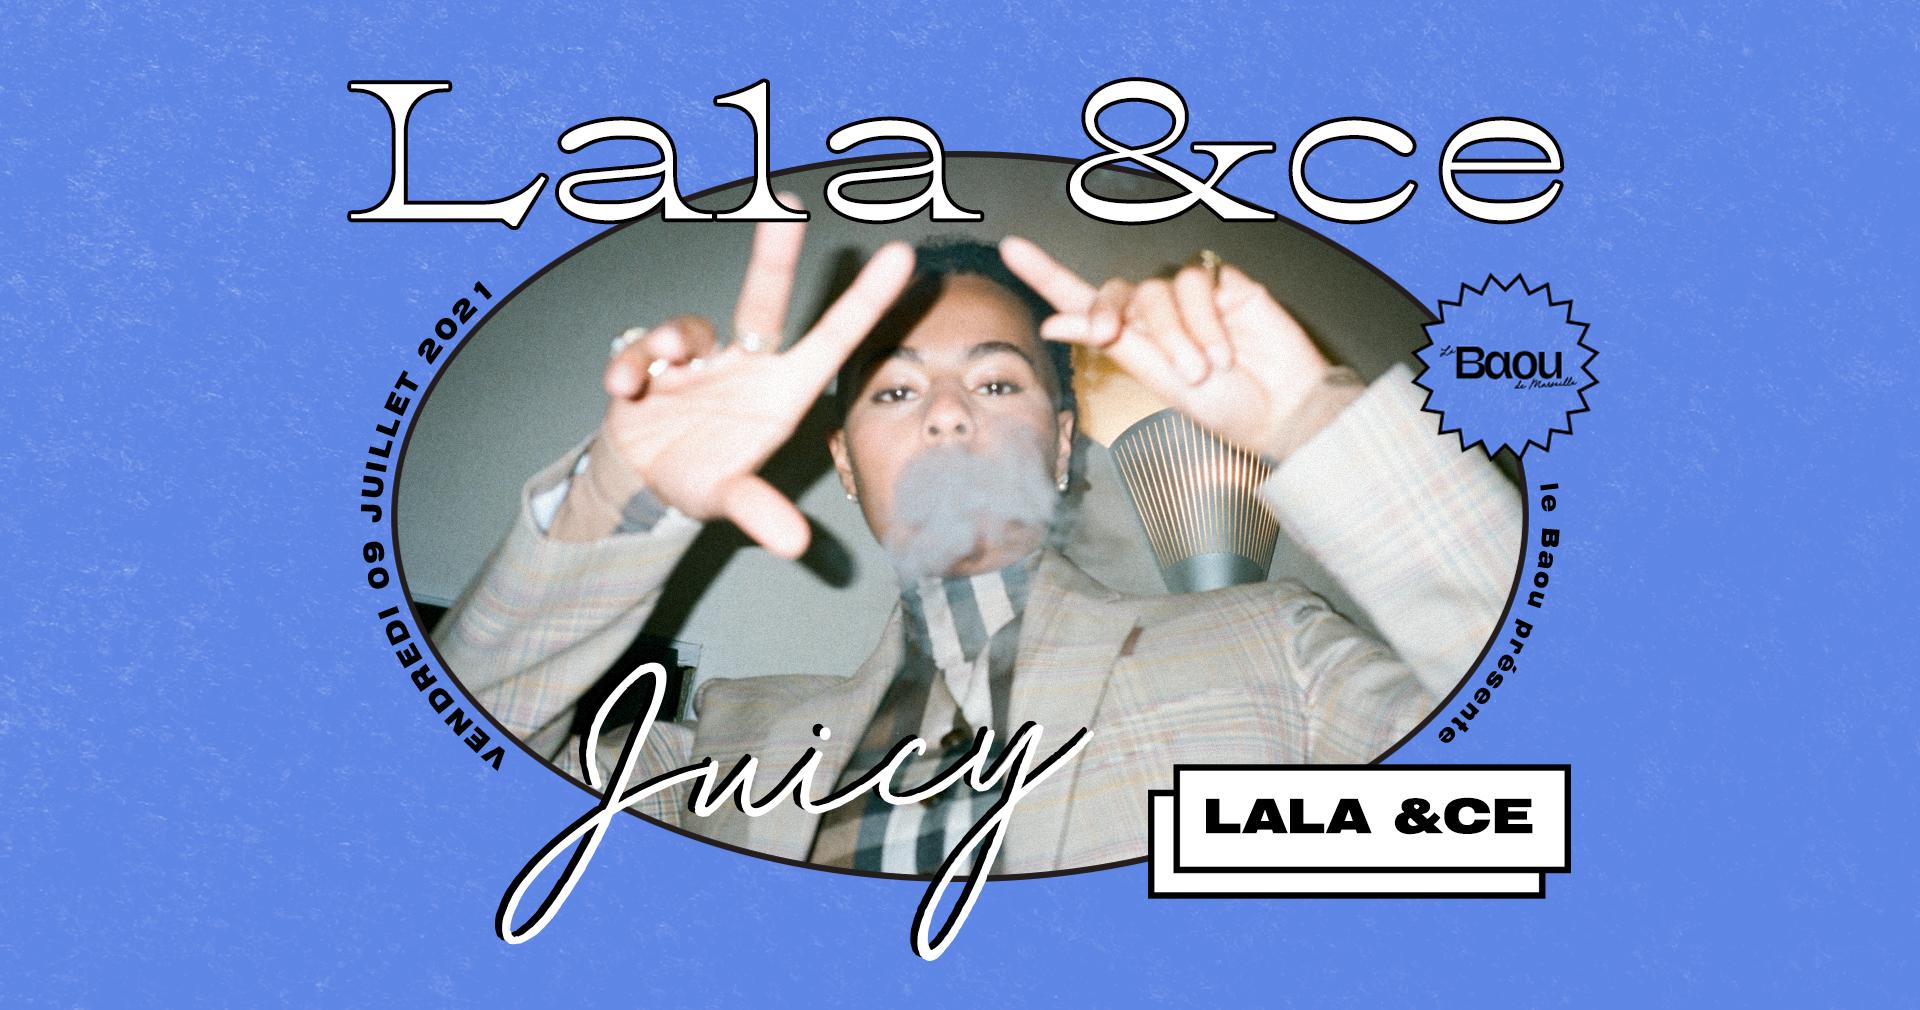 BAOU : Juicy / Lala &ce